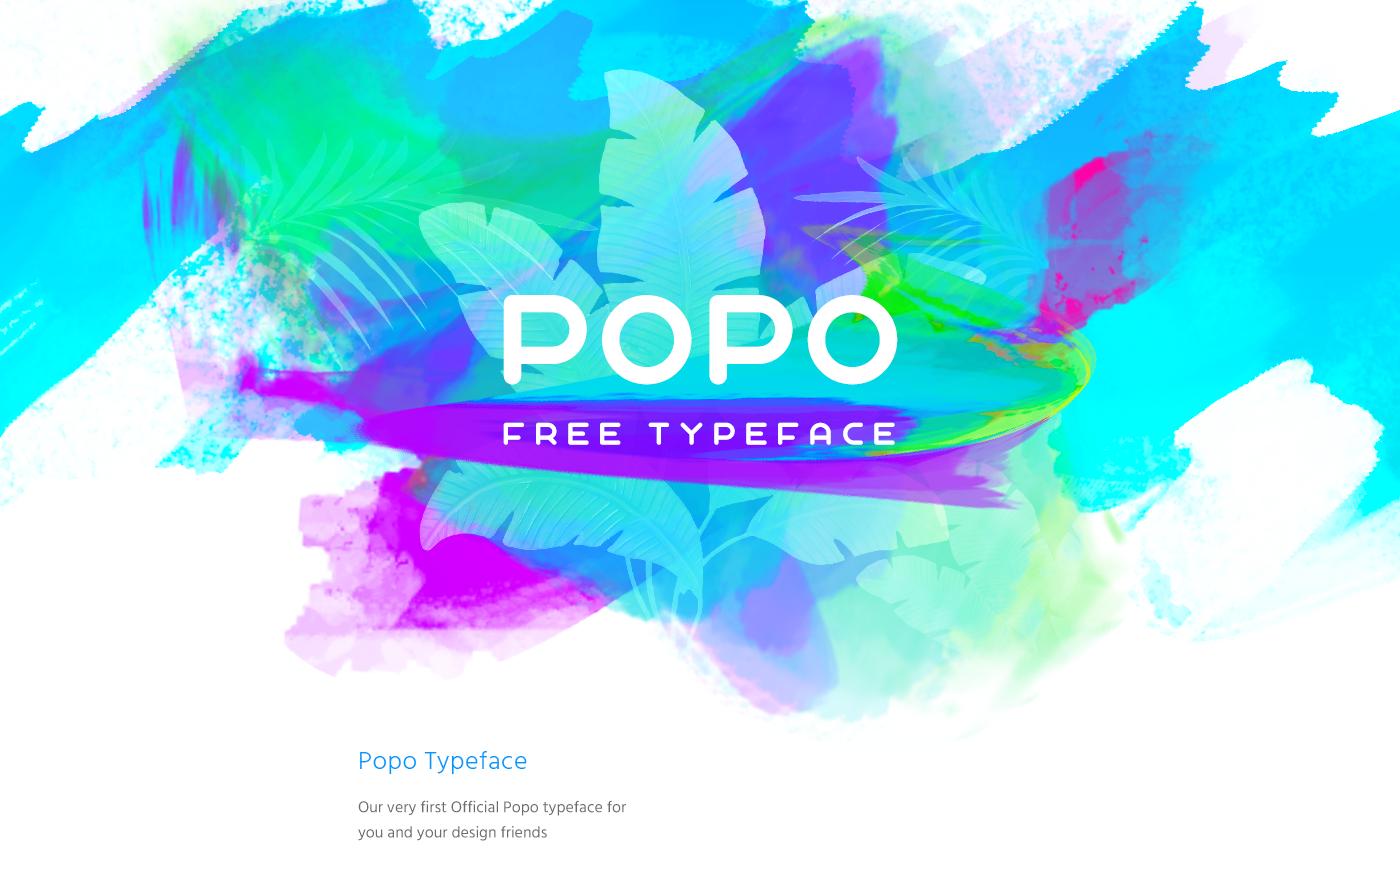 Free font font Typeface free download dropbox freebie Pixeden  envato